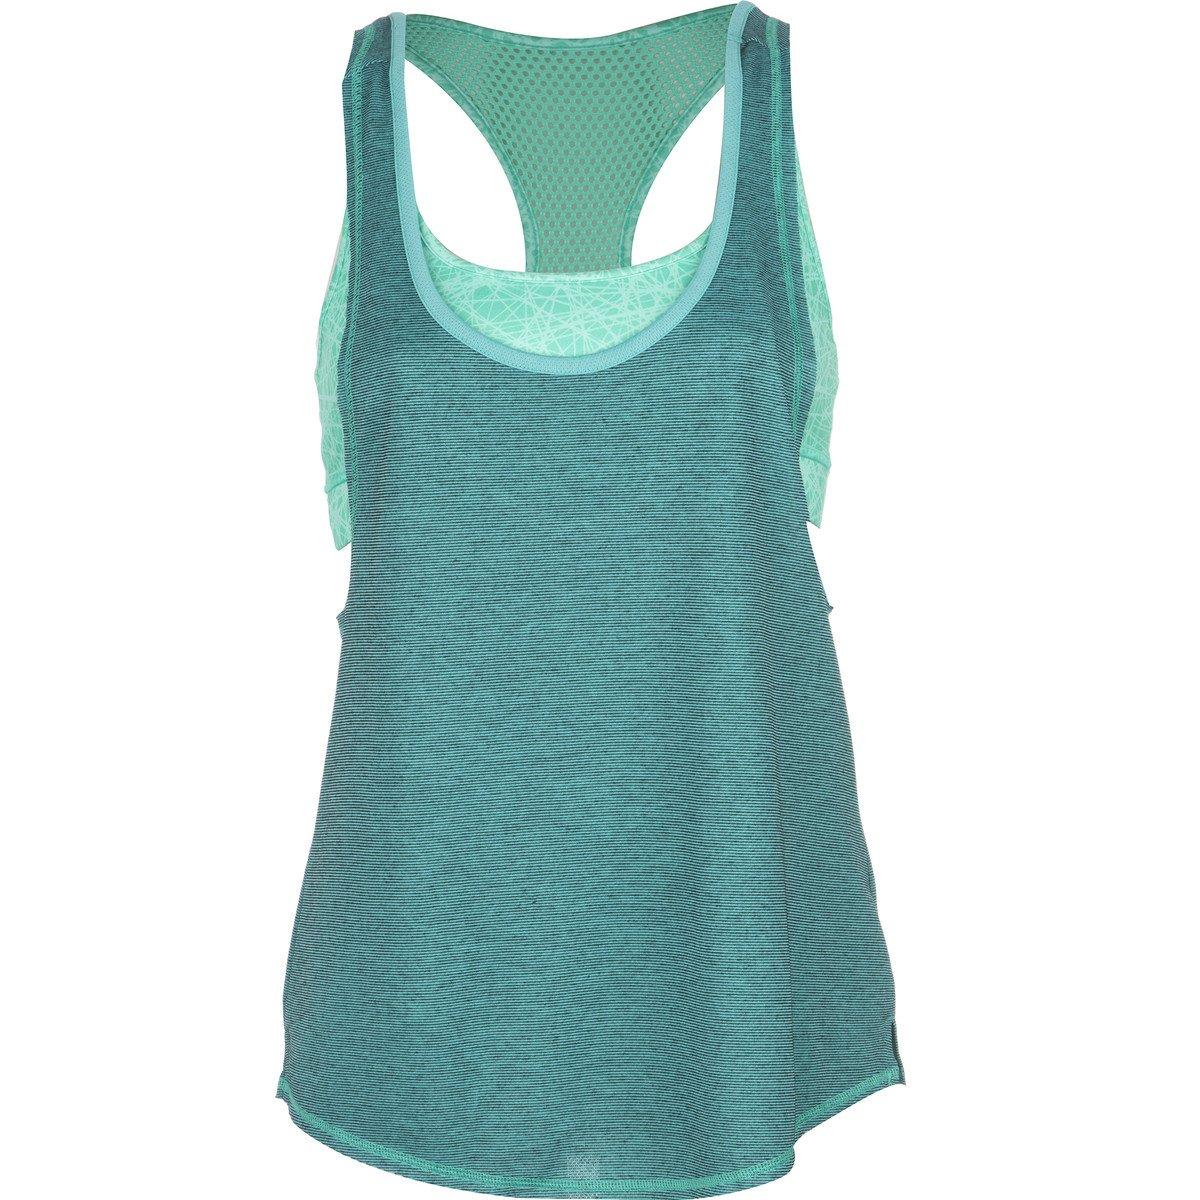 9eb74f6e06e52 Amazon.com  Hurley Juniors  Dri-Fit Tank Top with Sport Bra  Clothing